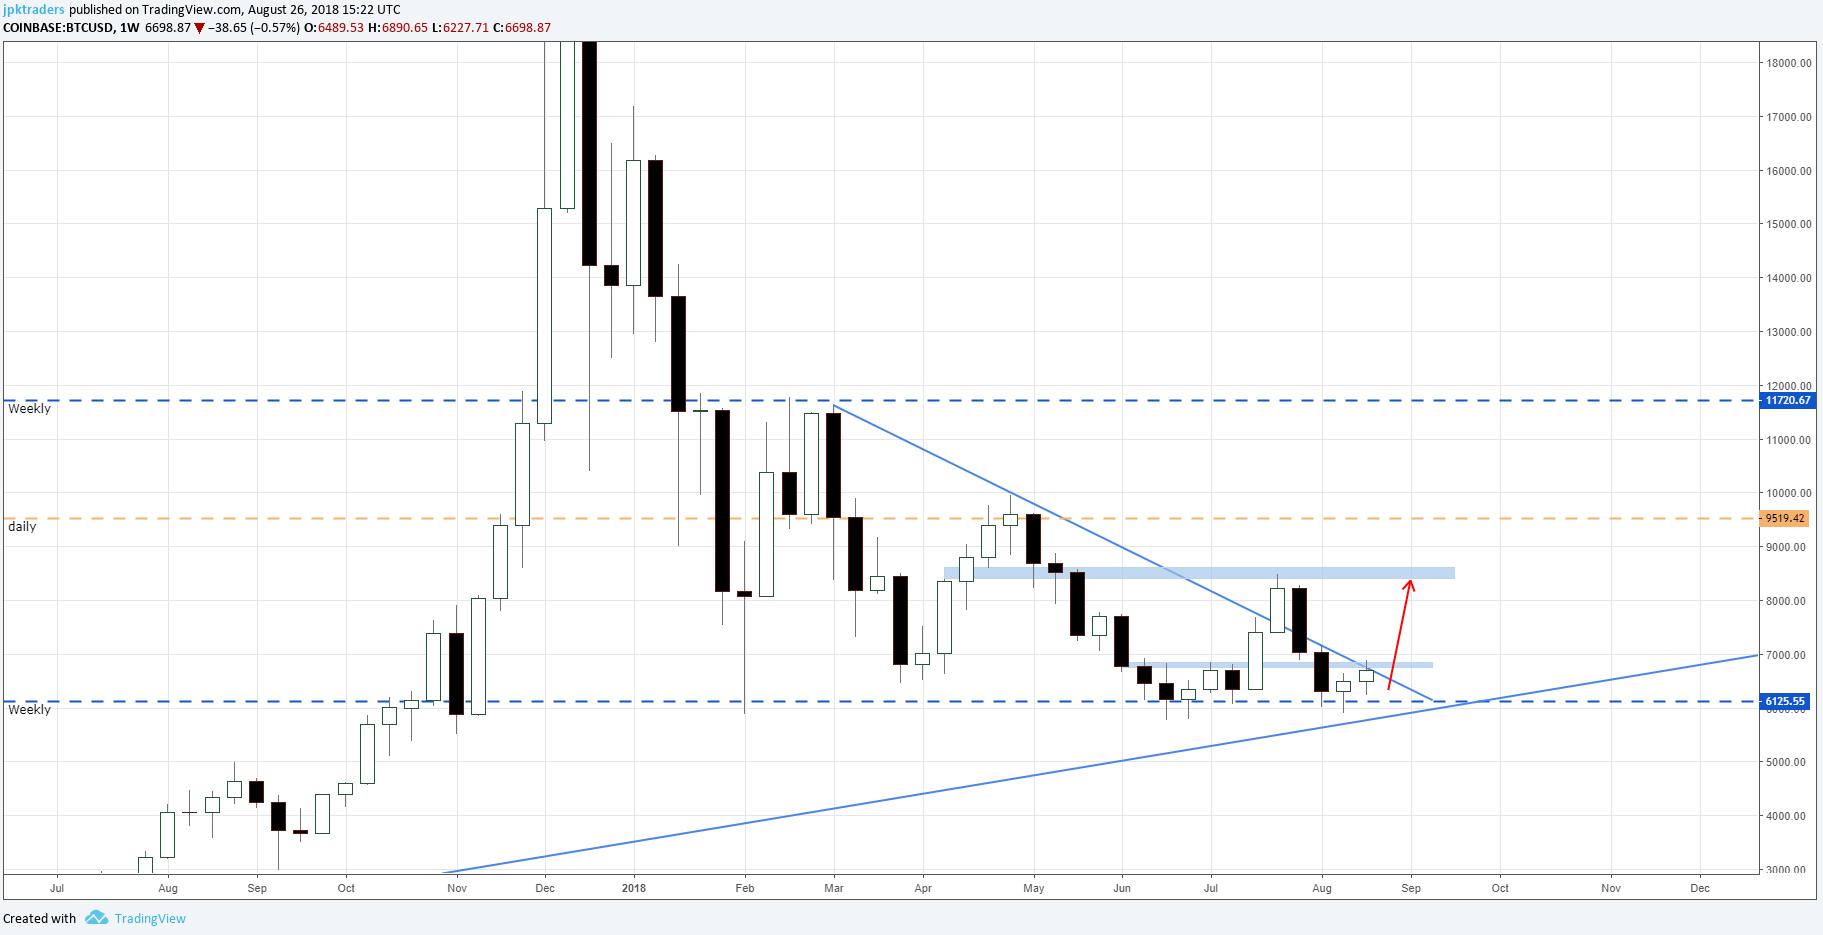 pl.tradingview.com Dominacja Bitcoina